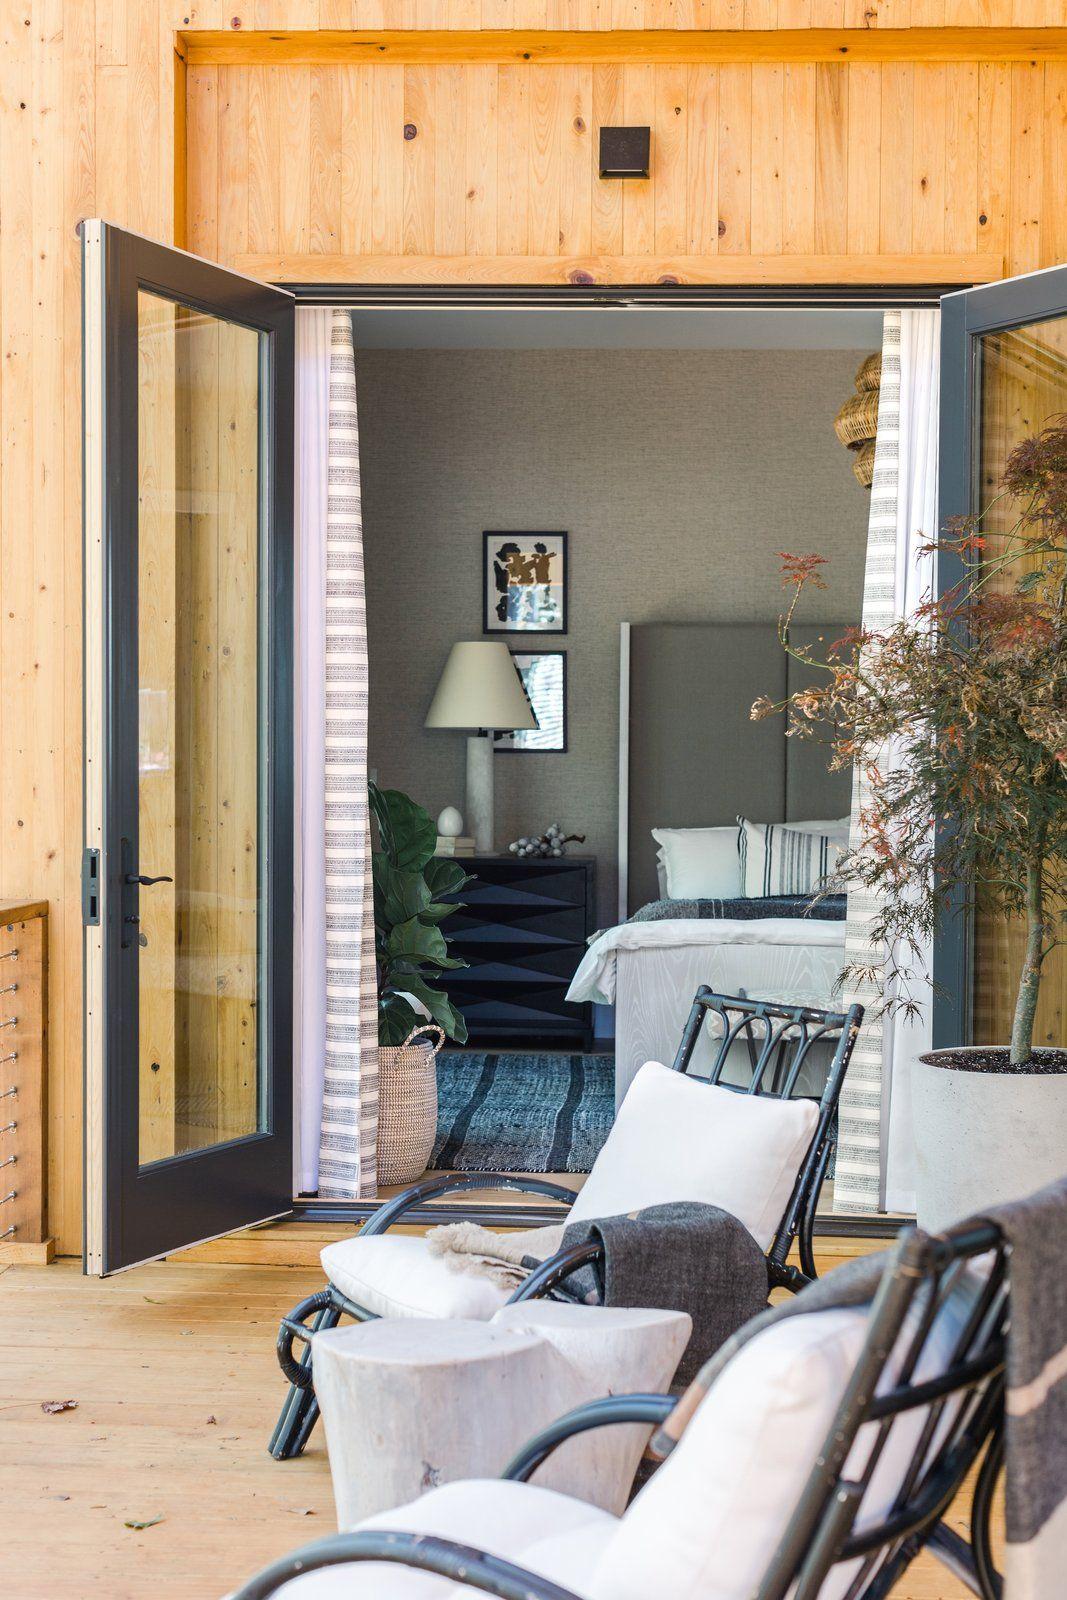 c536e5e376ed Naturally House Balcony  terrace  bedroomdesign  bedroomdecor  balconydecor   balconyfurniture